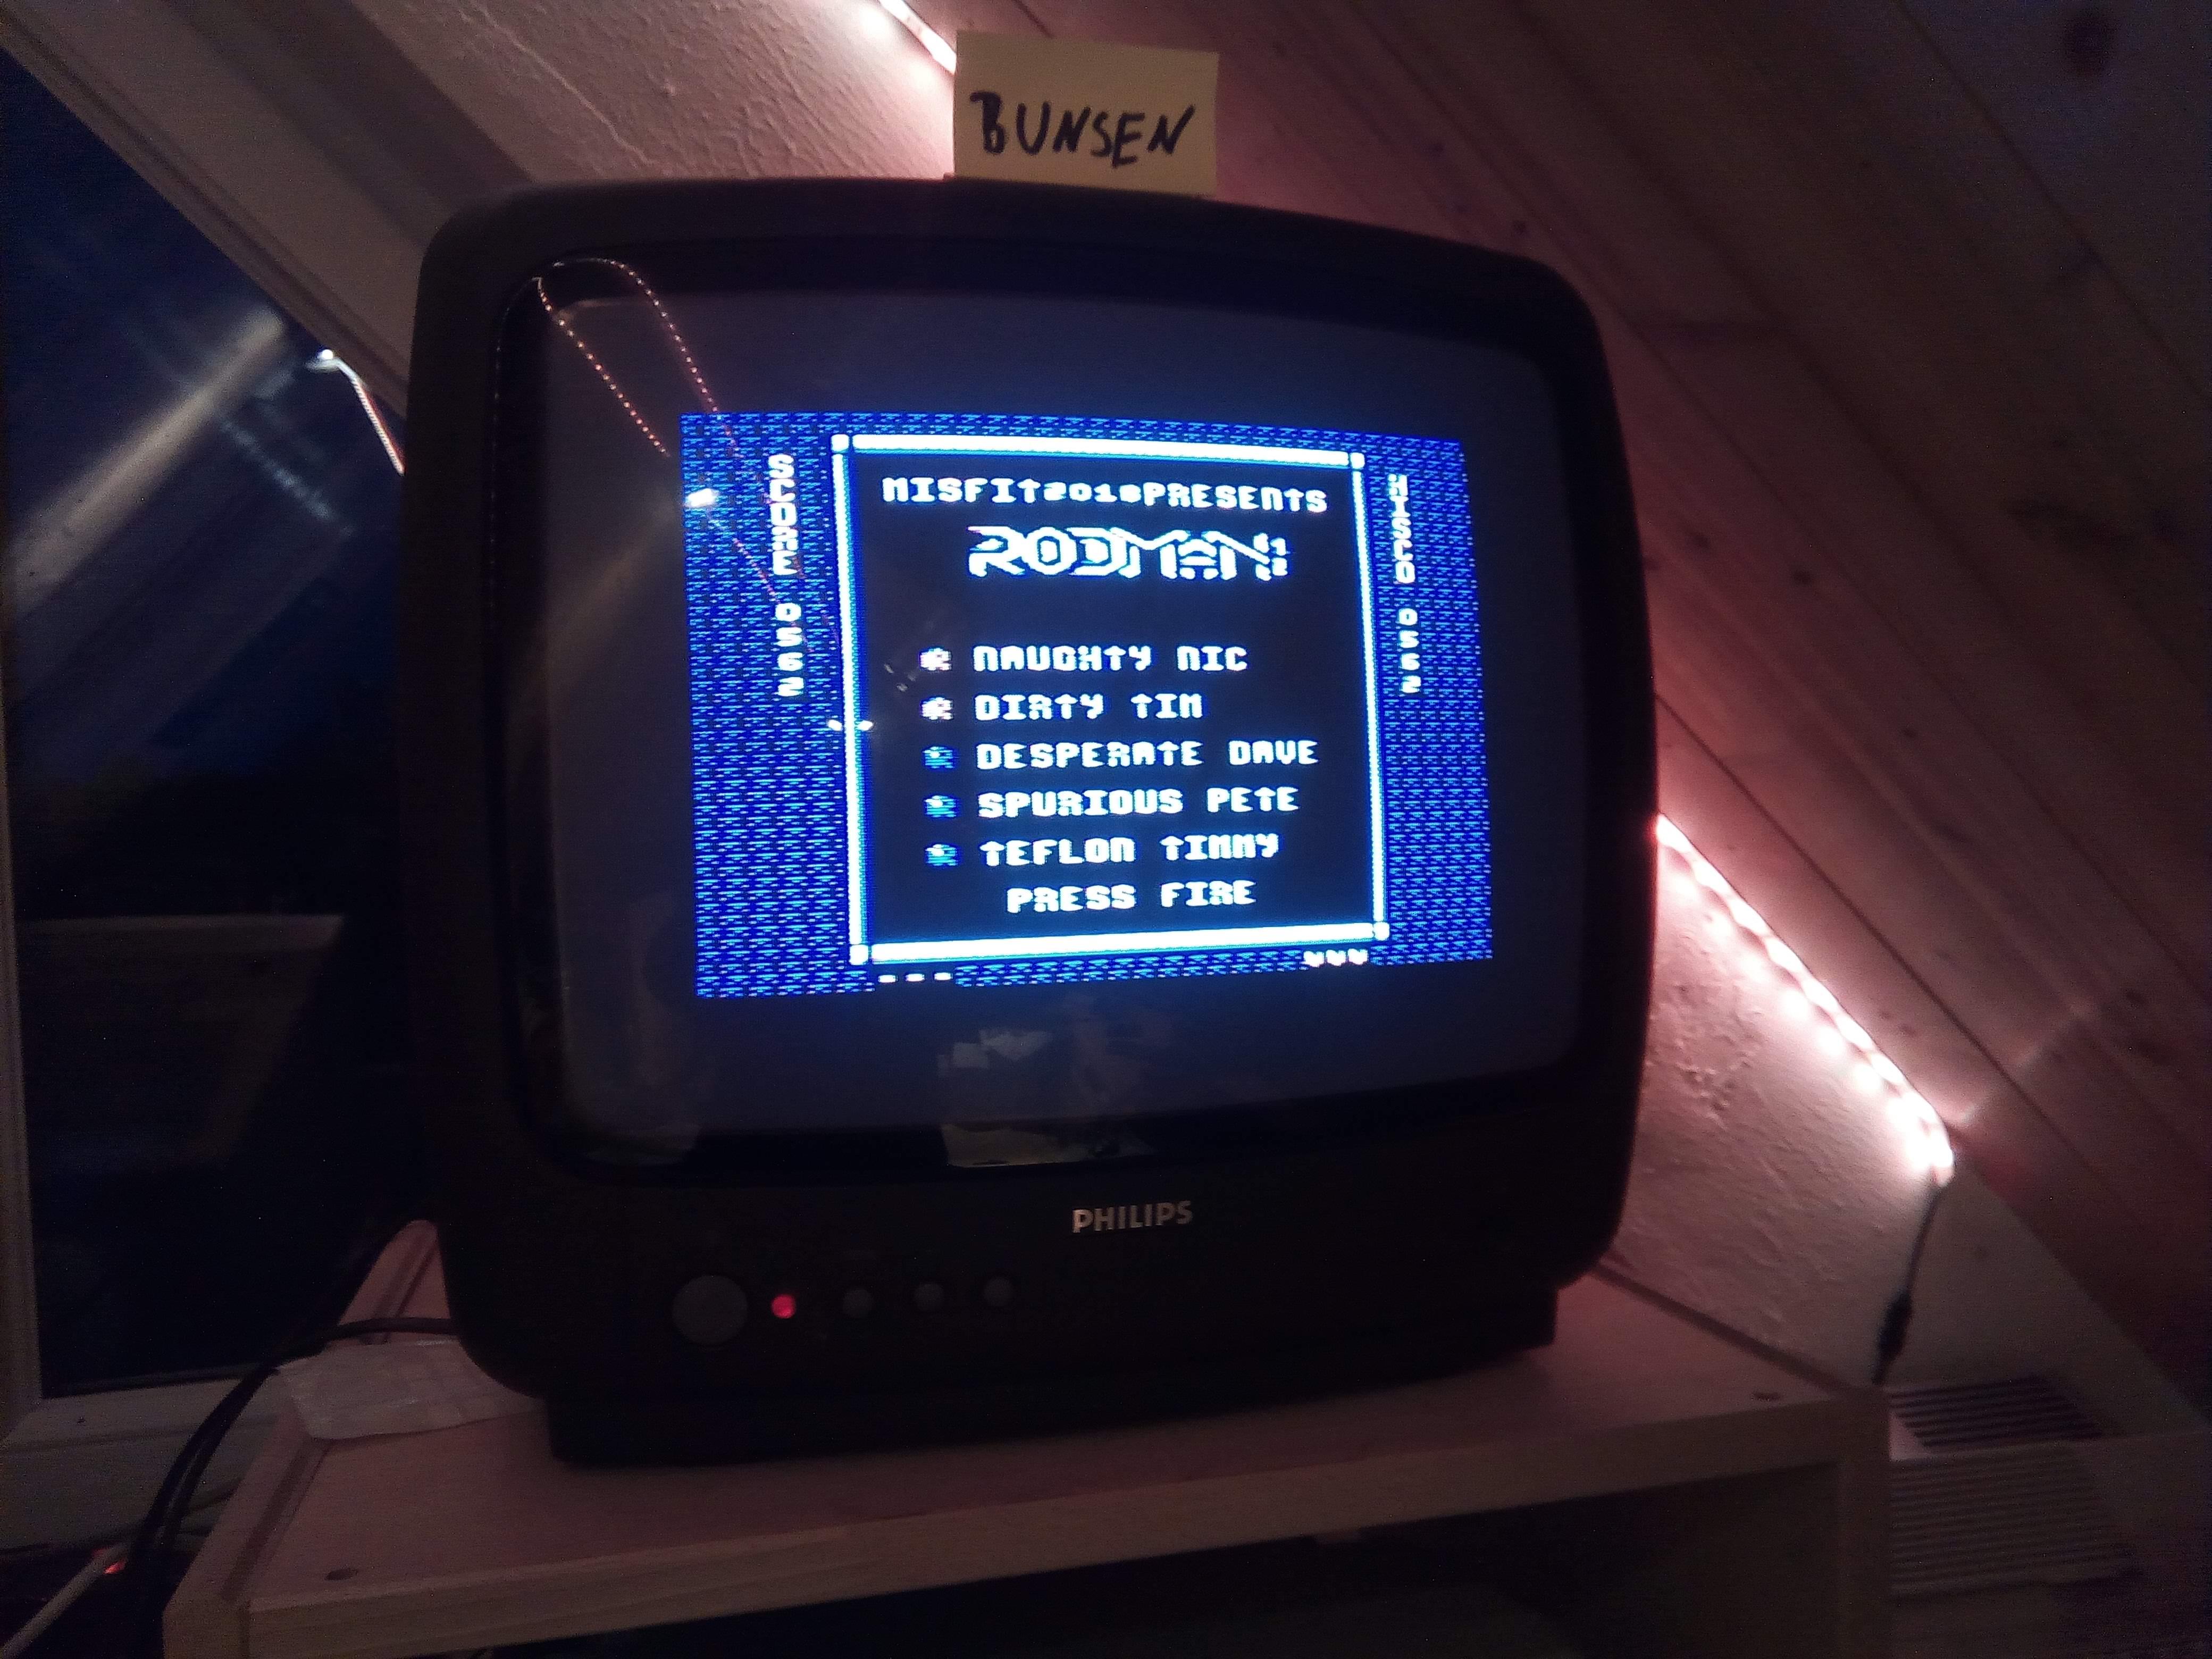 Bunsen: Rodman [LORES] (Atari 400/800/XL/XE) 562 points on 2020-04-25 16:06:52